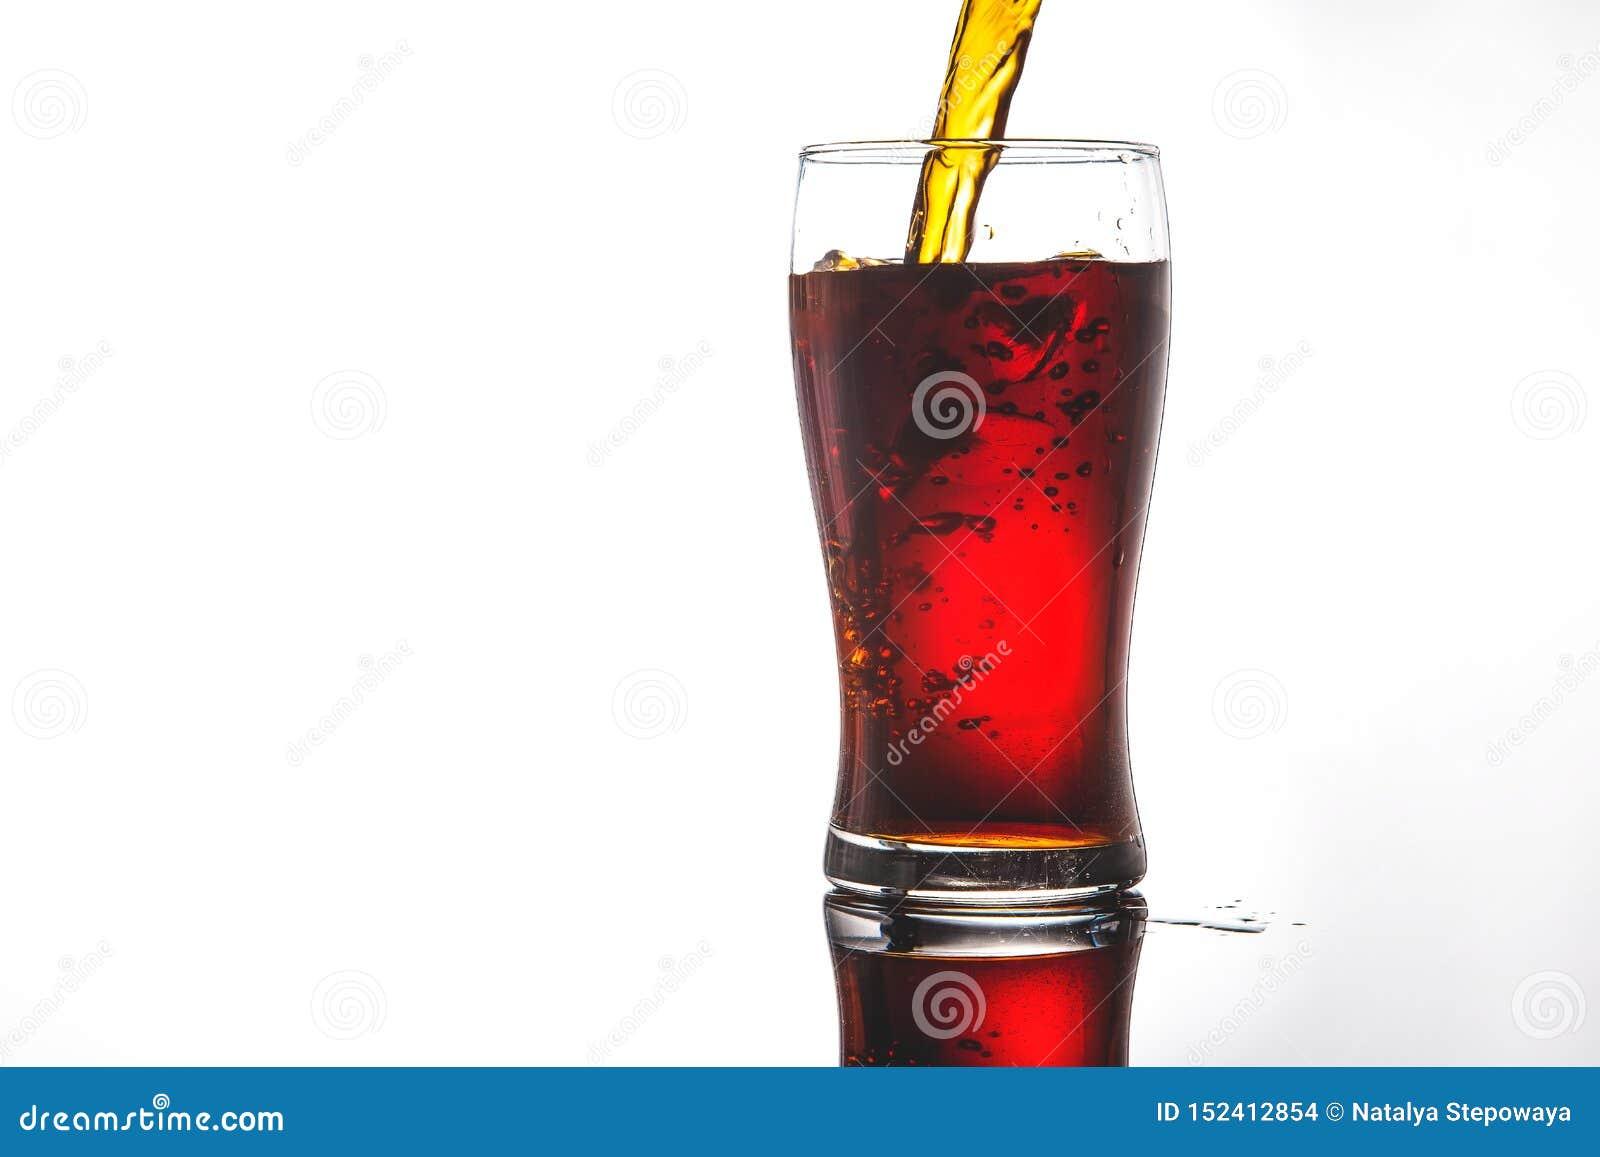 Hällande cola in i exponeringsglas med is på vitt bakgrundskopieringsutrymme